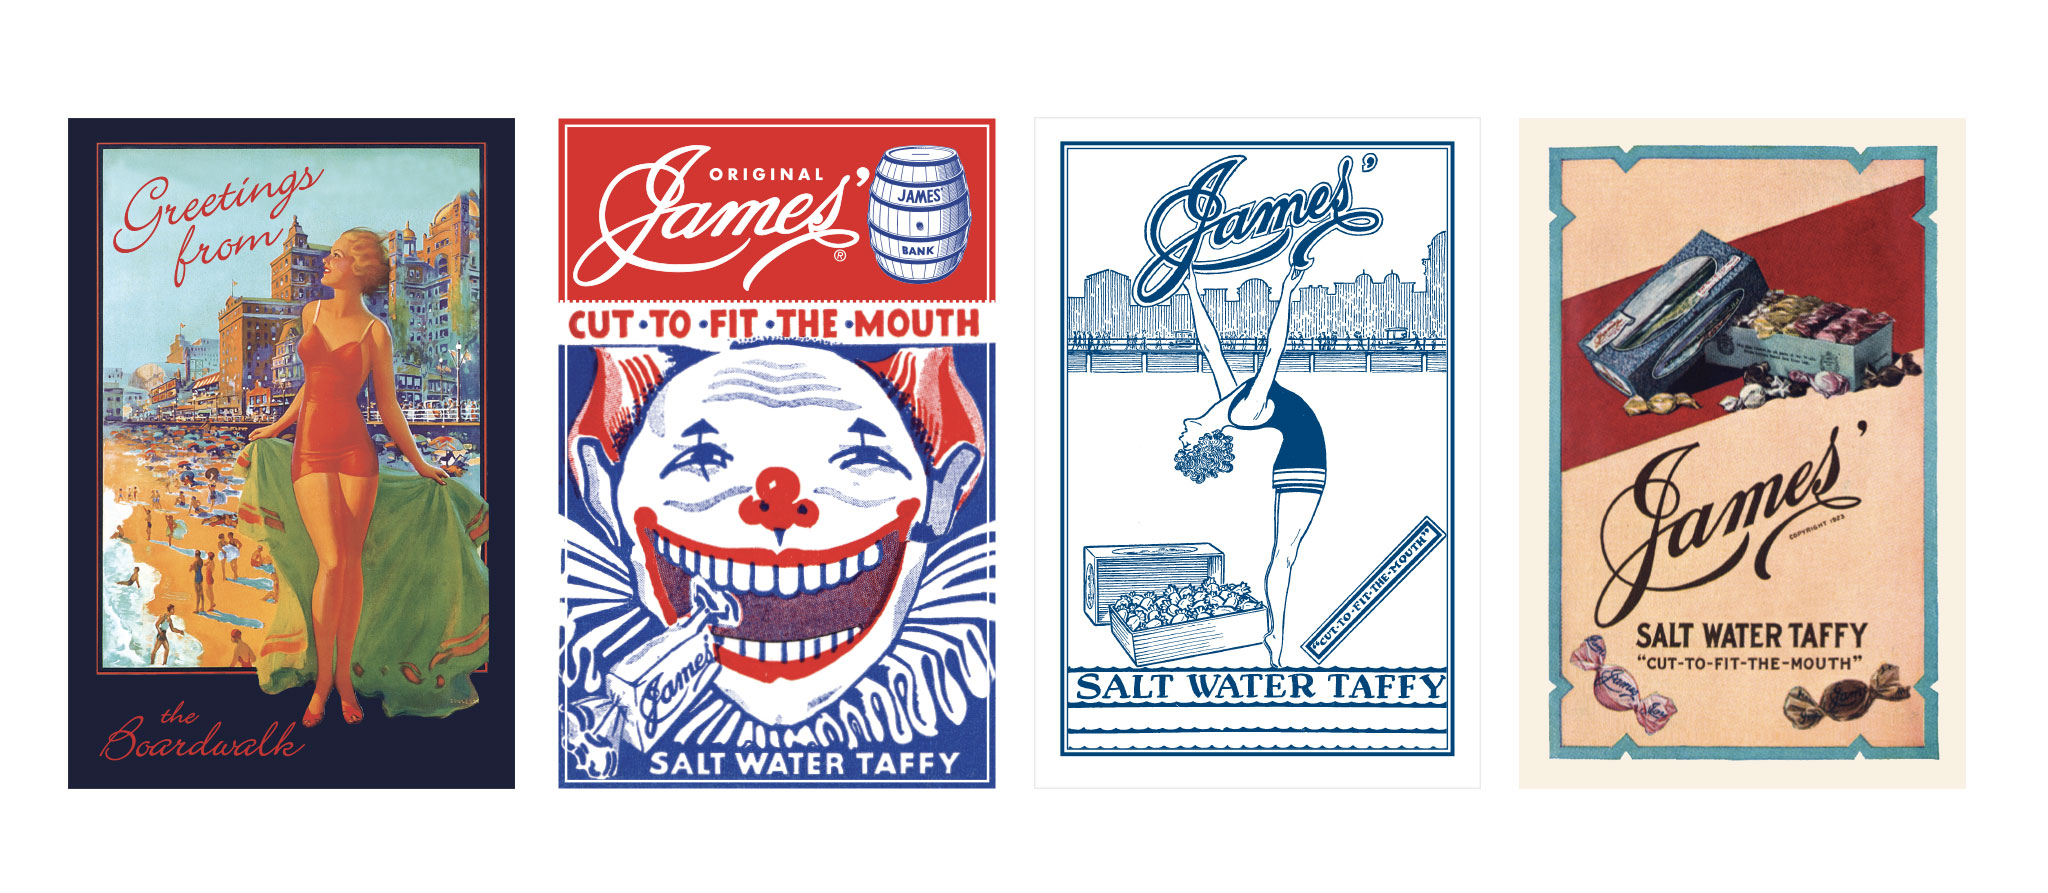 James-Candy-Company_15.jpg